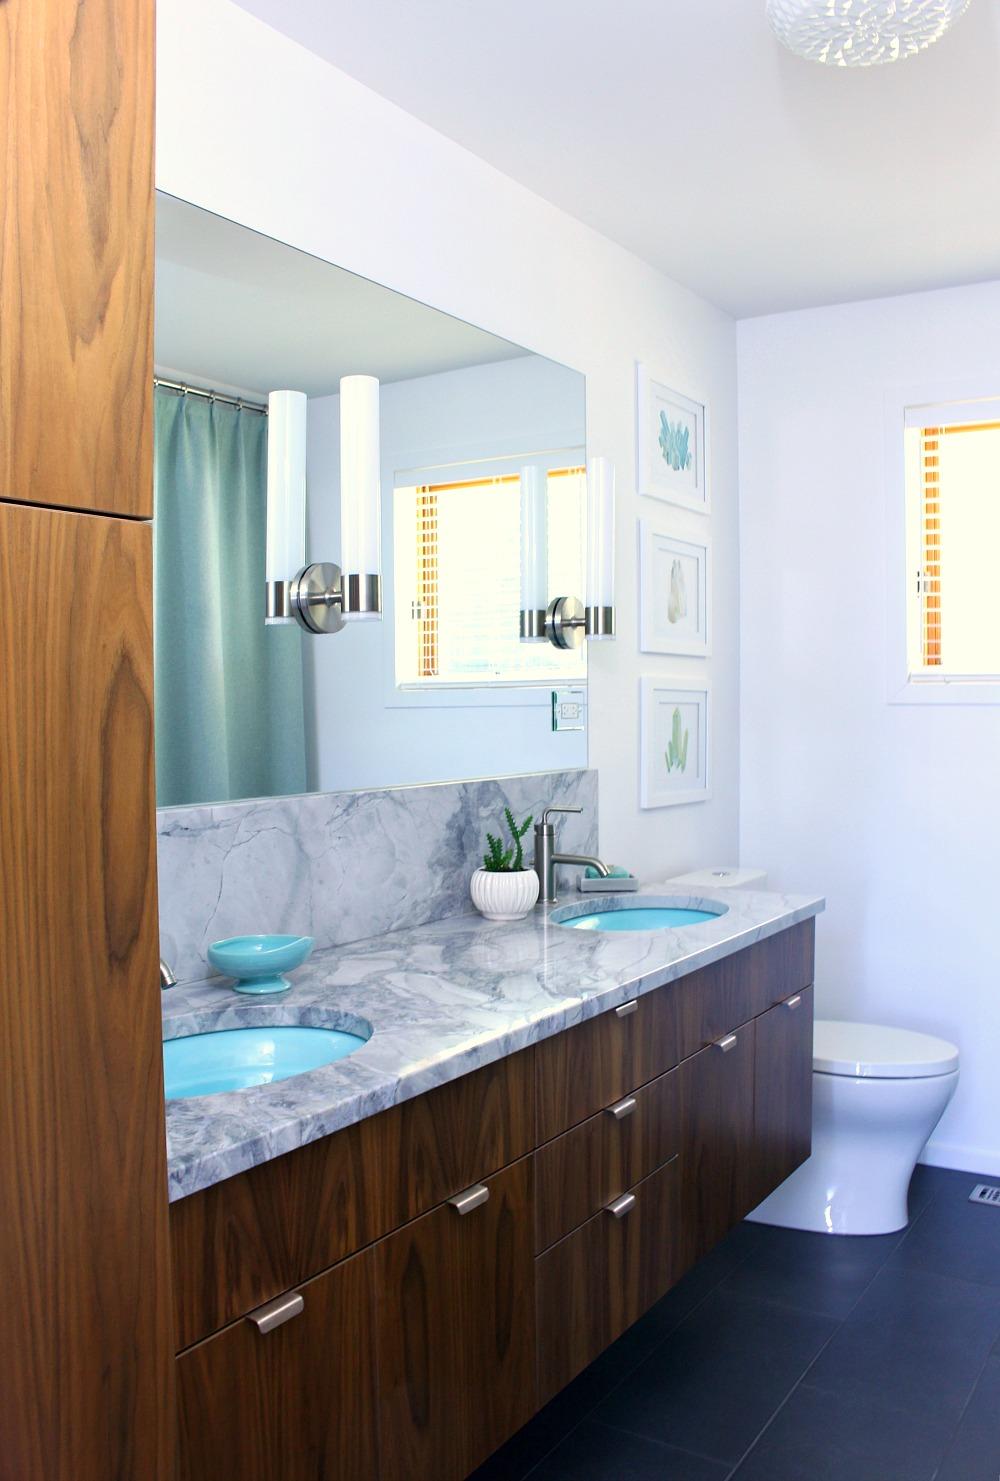 A Mid-Century Modern Inspired Bathroom Renovation - Before ...